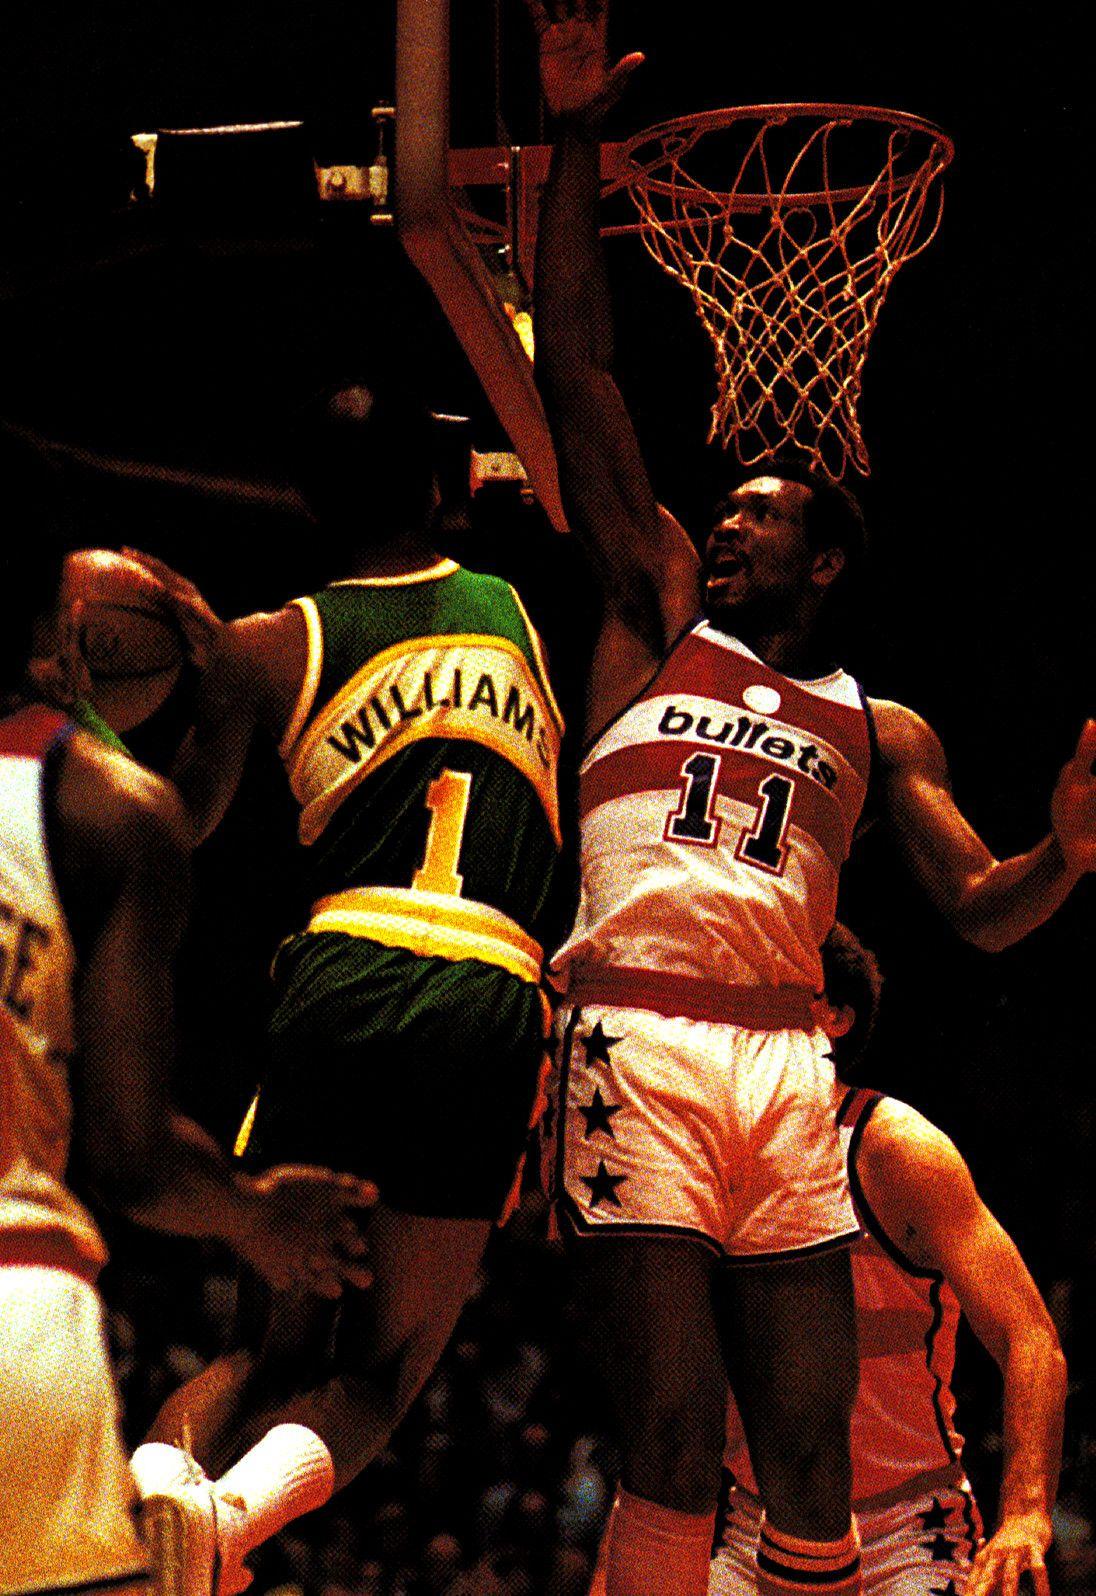 Gus Williams & Elvin Hayes Rare NBA s Pinterest